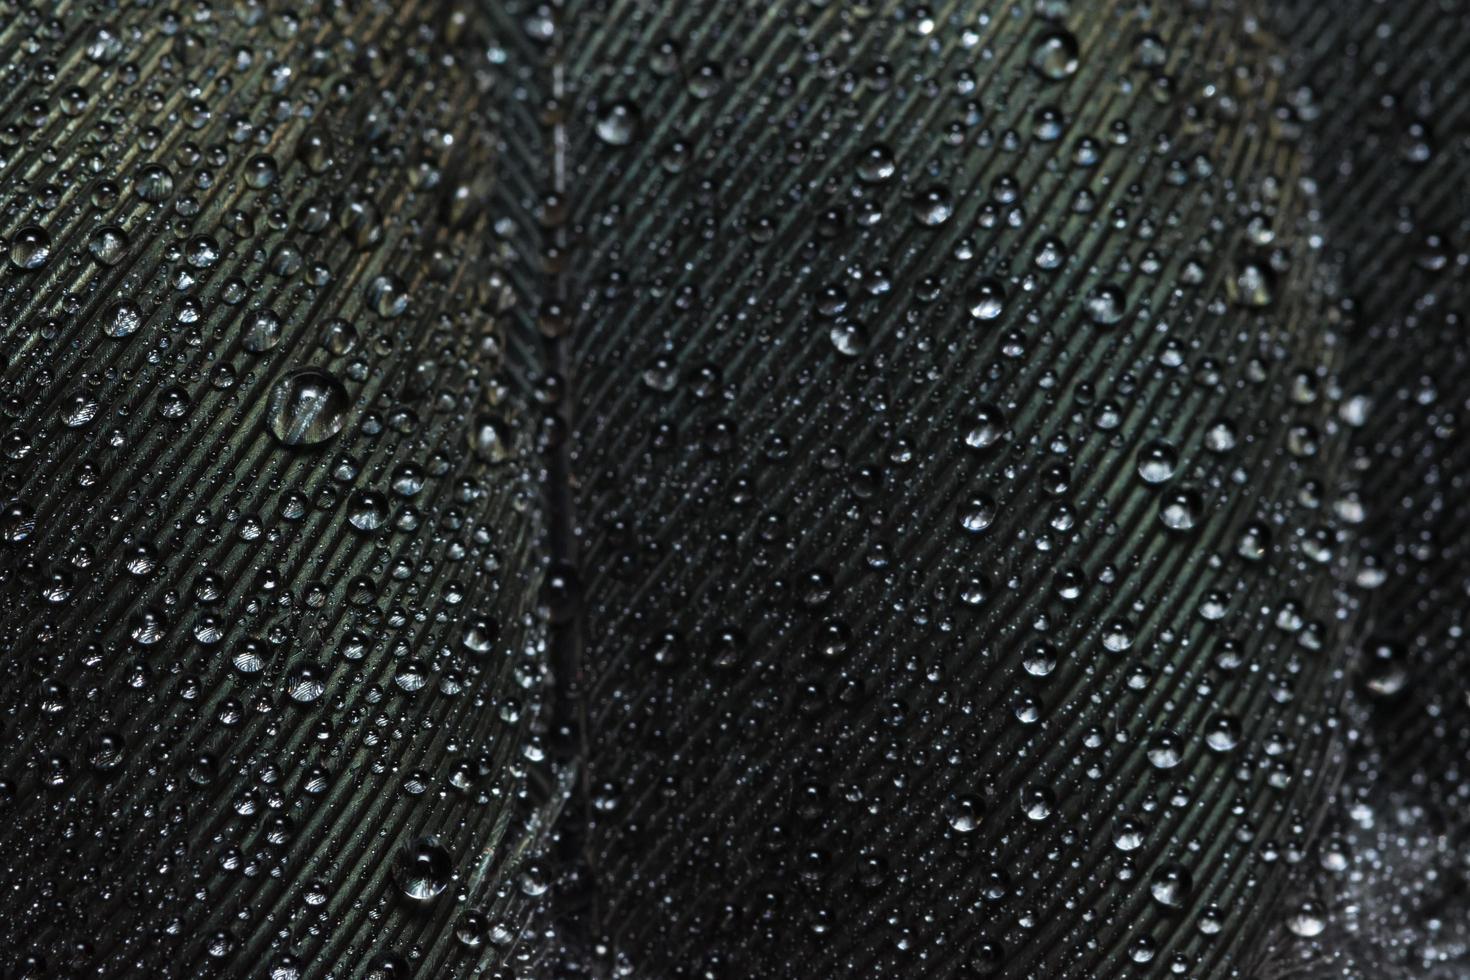 vattendroppar på en fjäder foto